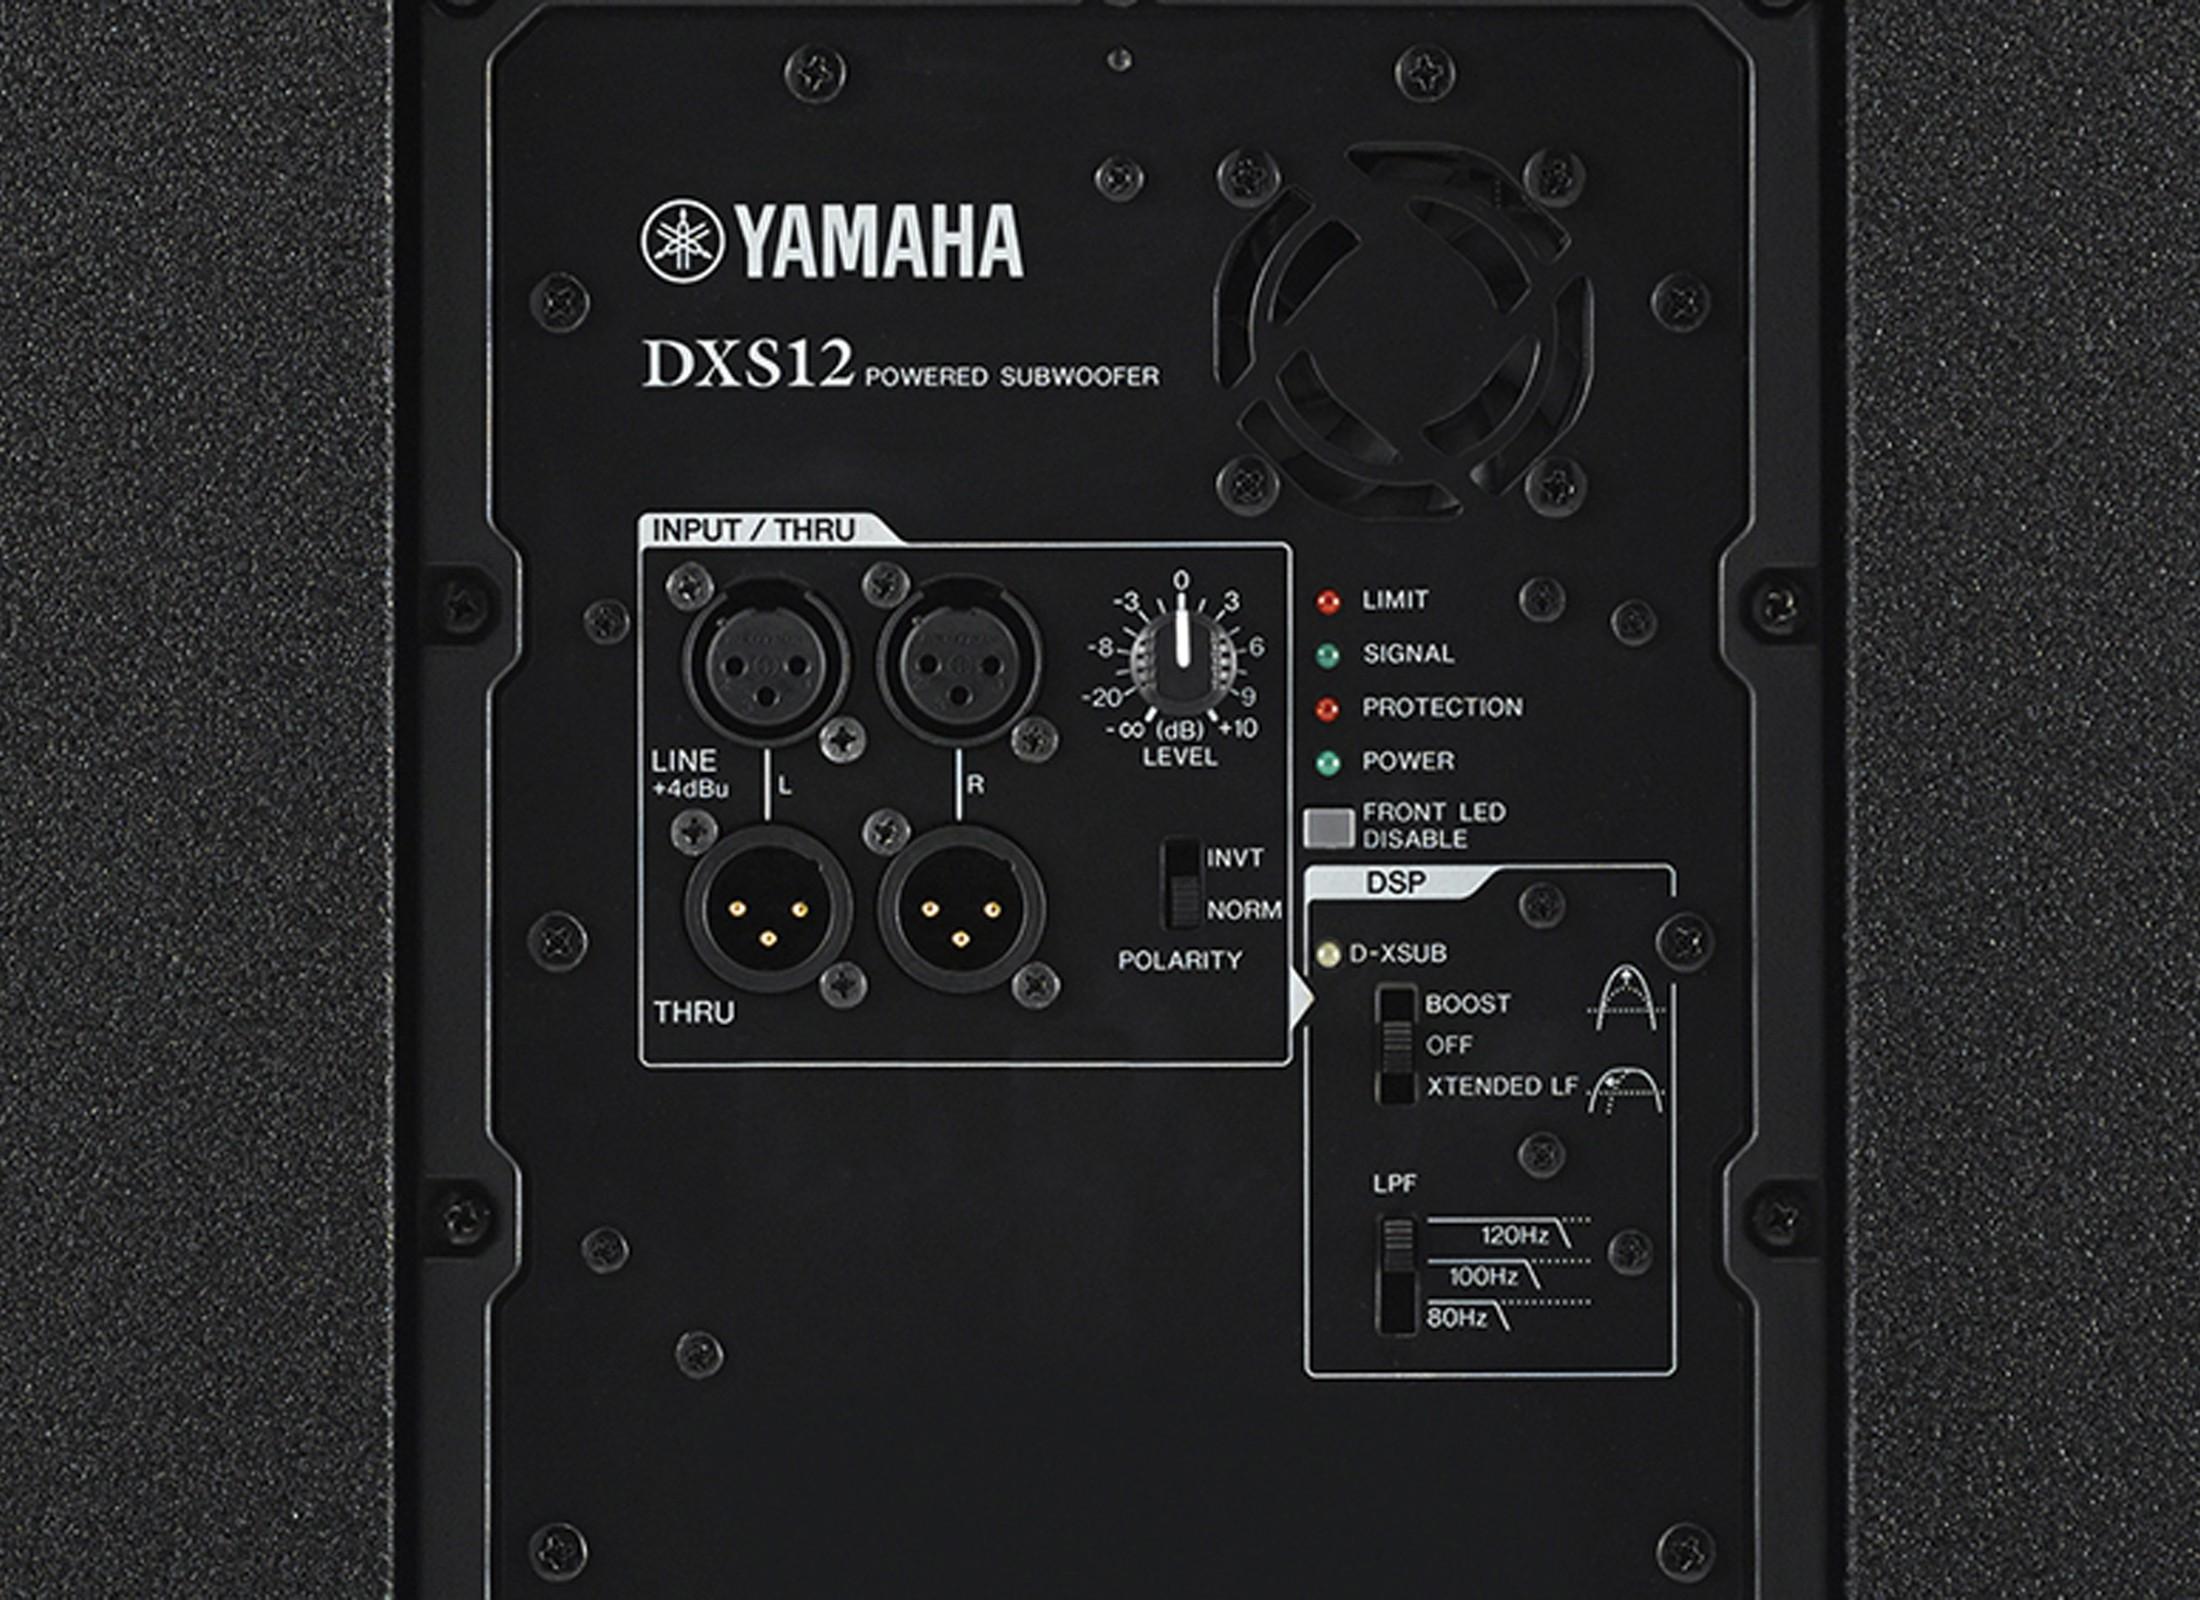 Yamaha dxs 12 aktiv subwoofer online at low prices at huss for Yamaha dxs12 specs